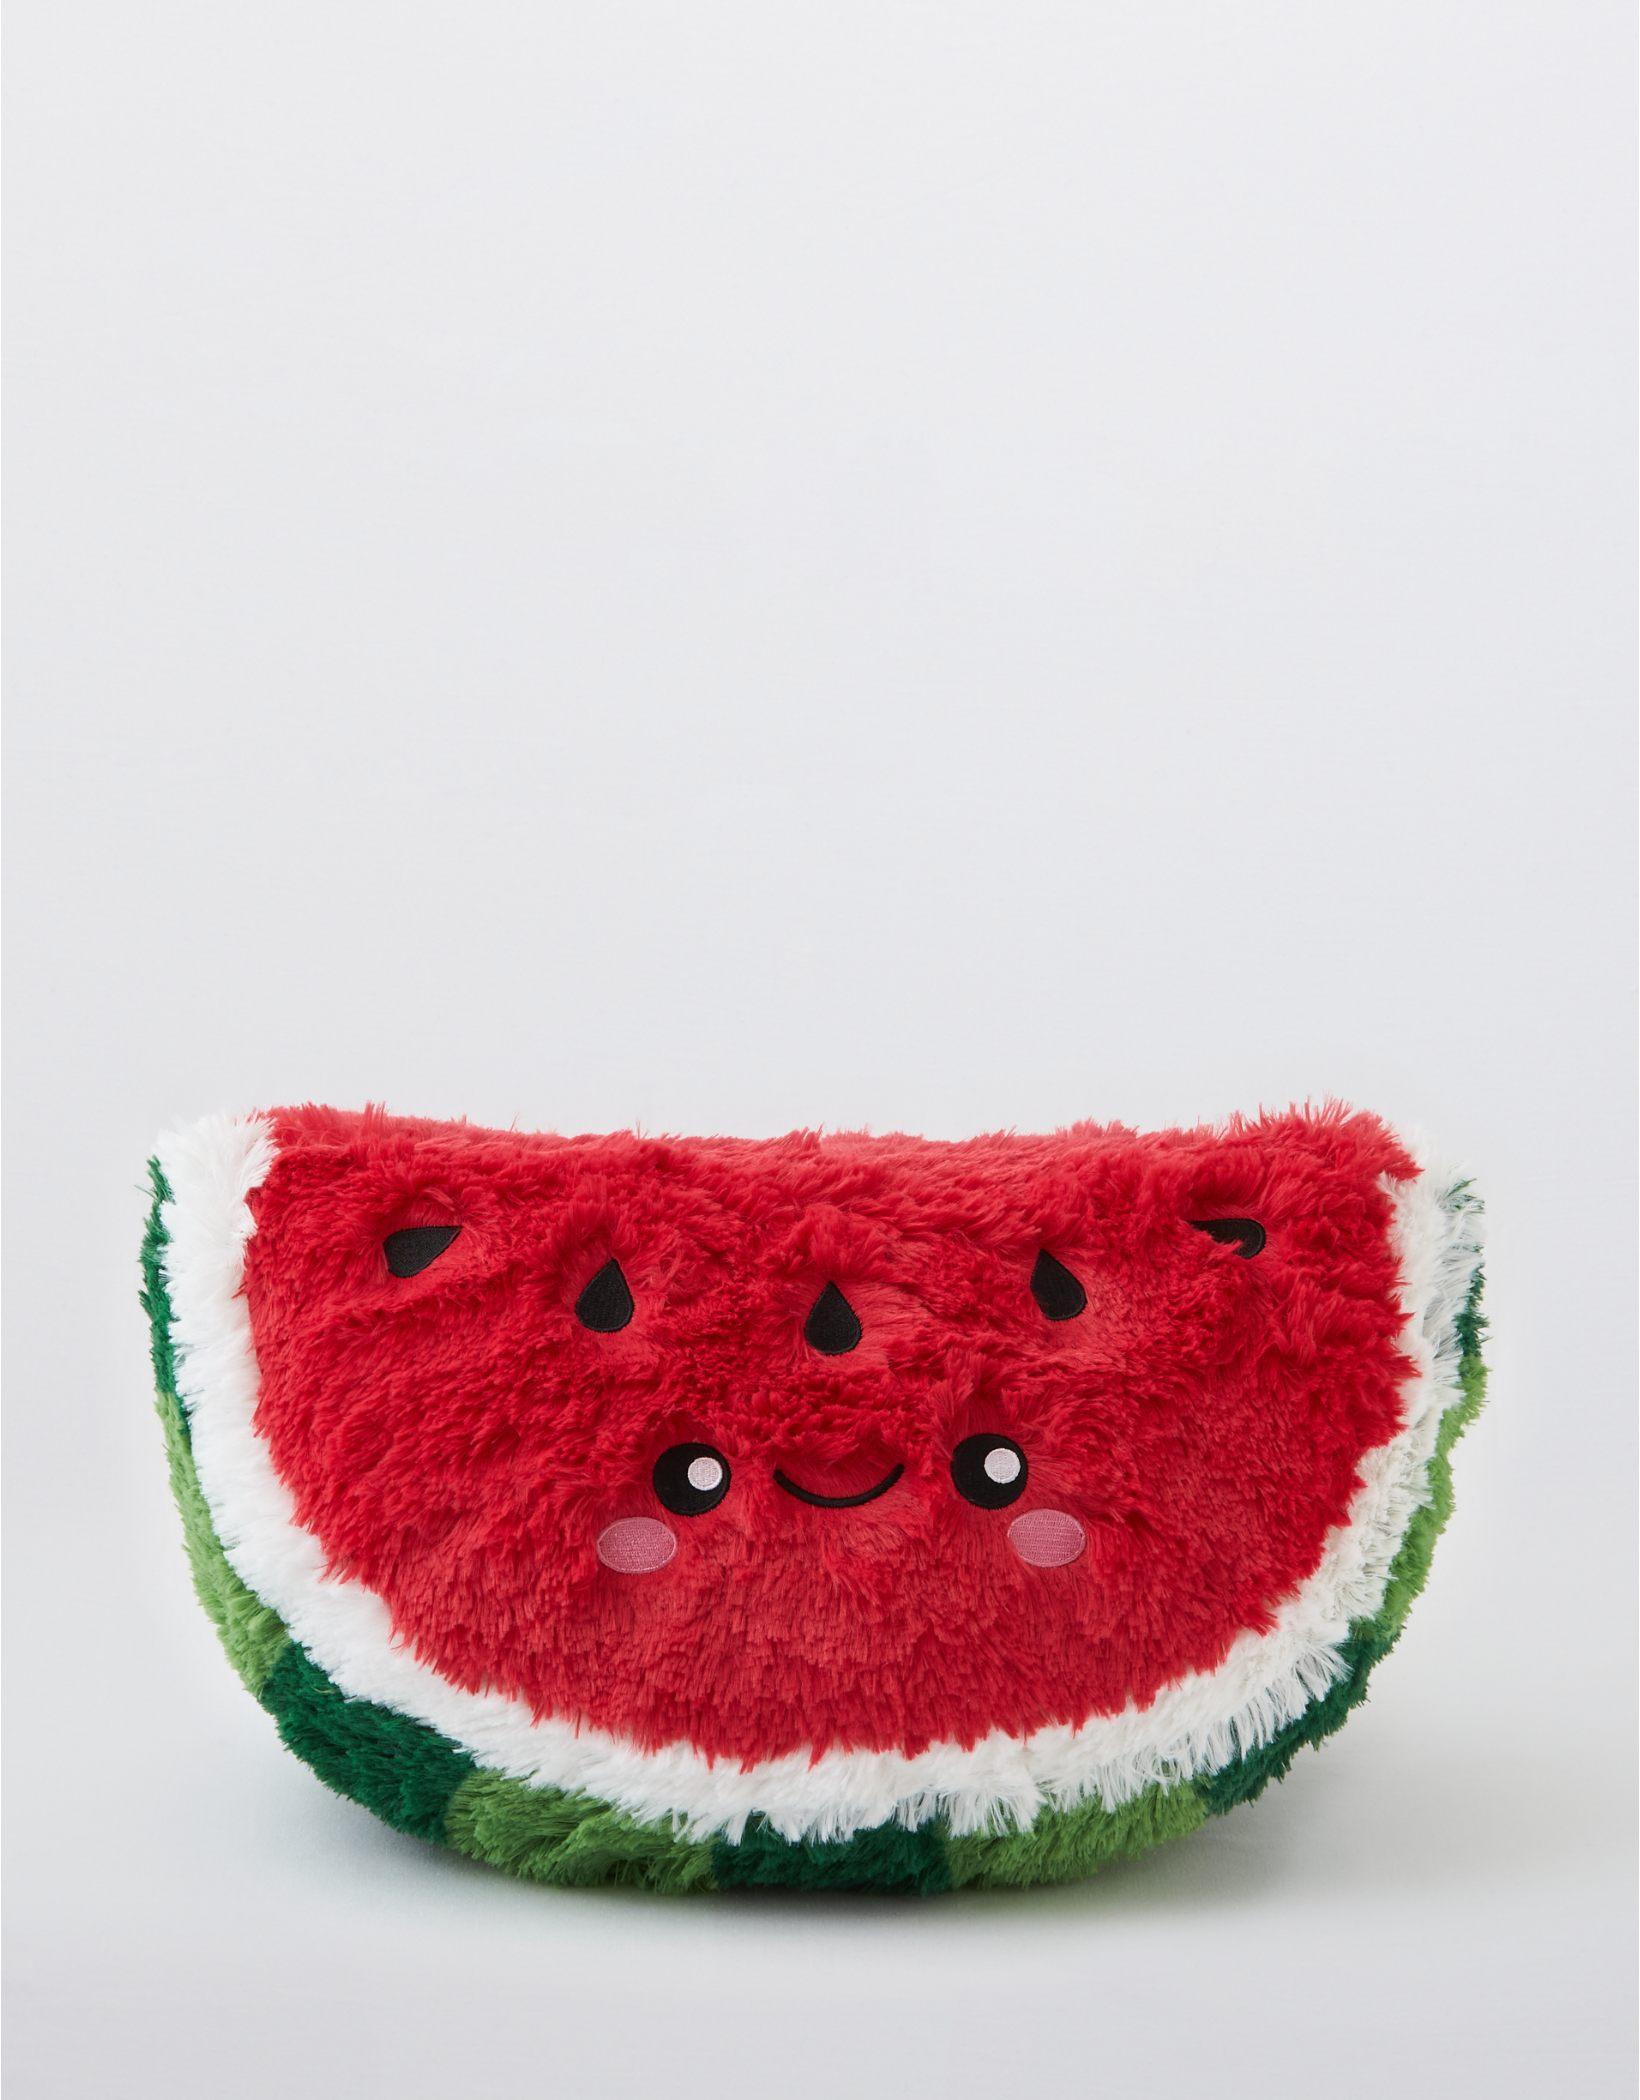 Squishable Watermelon